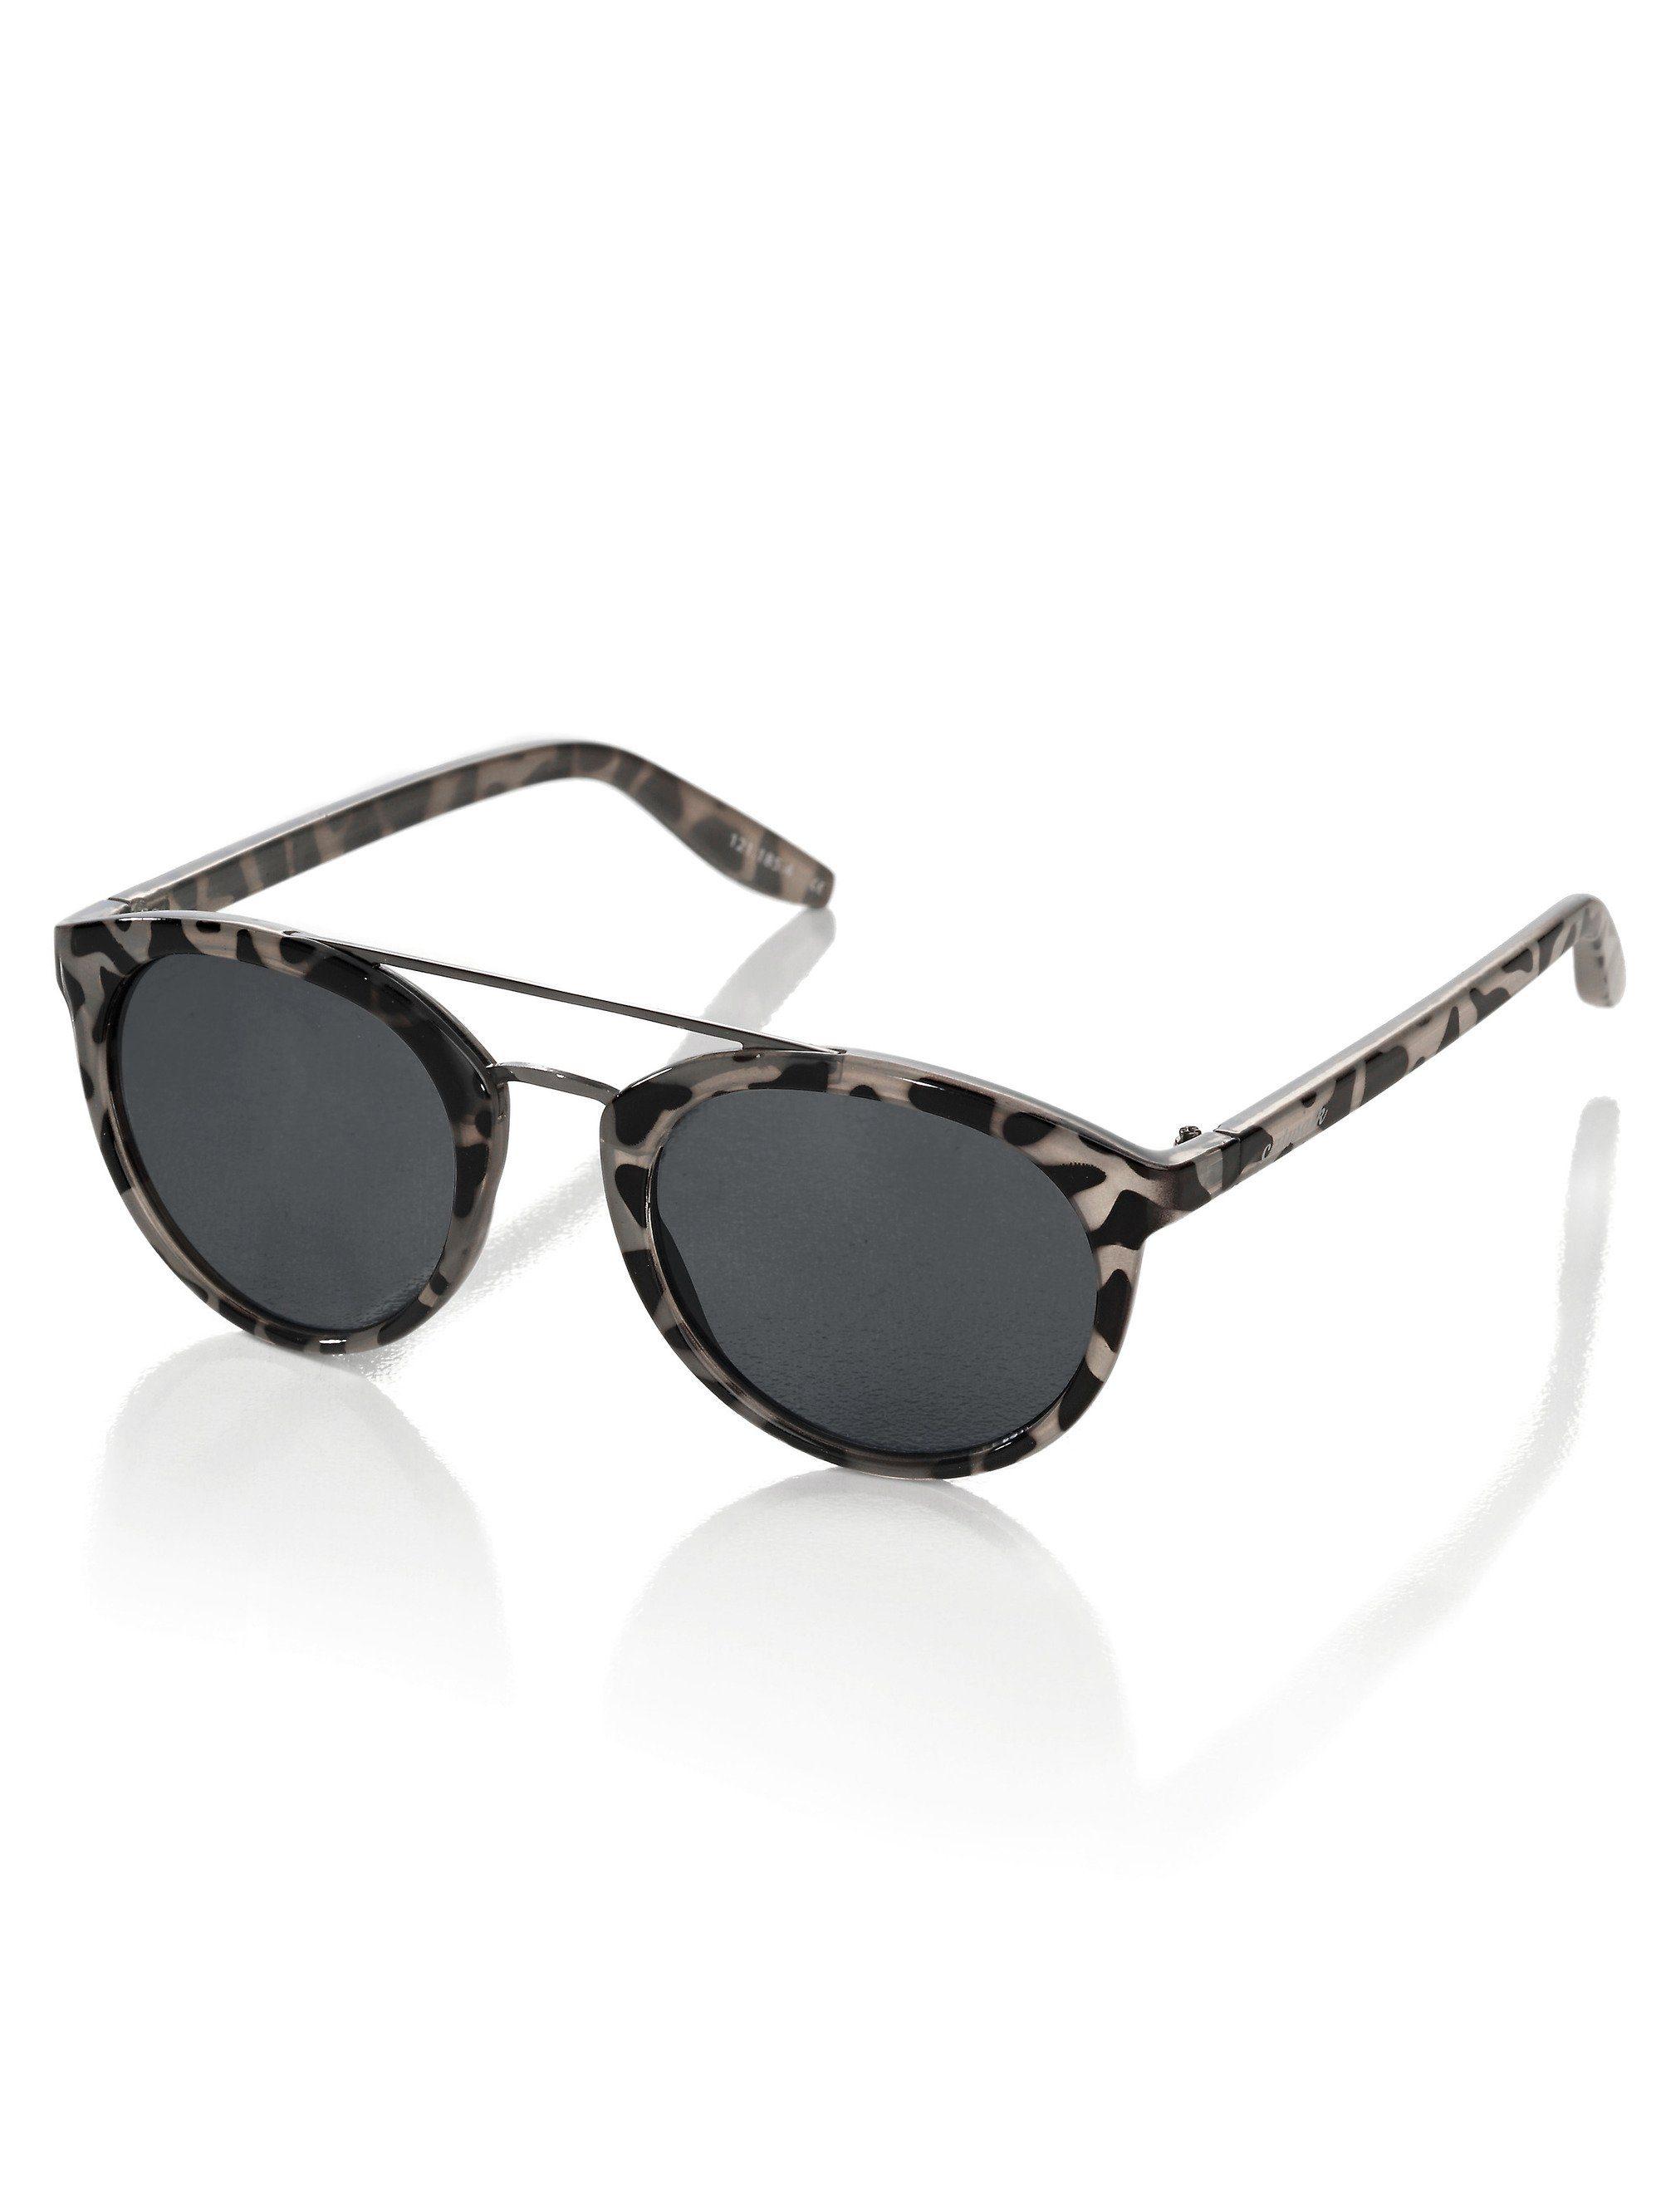 Sonnenbrille Alba Moda transparent grau eK3259AOM